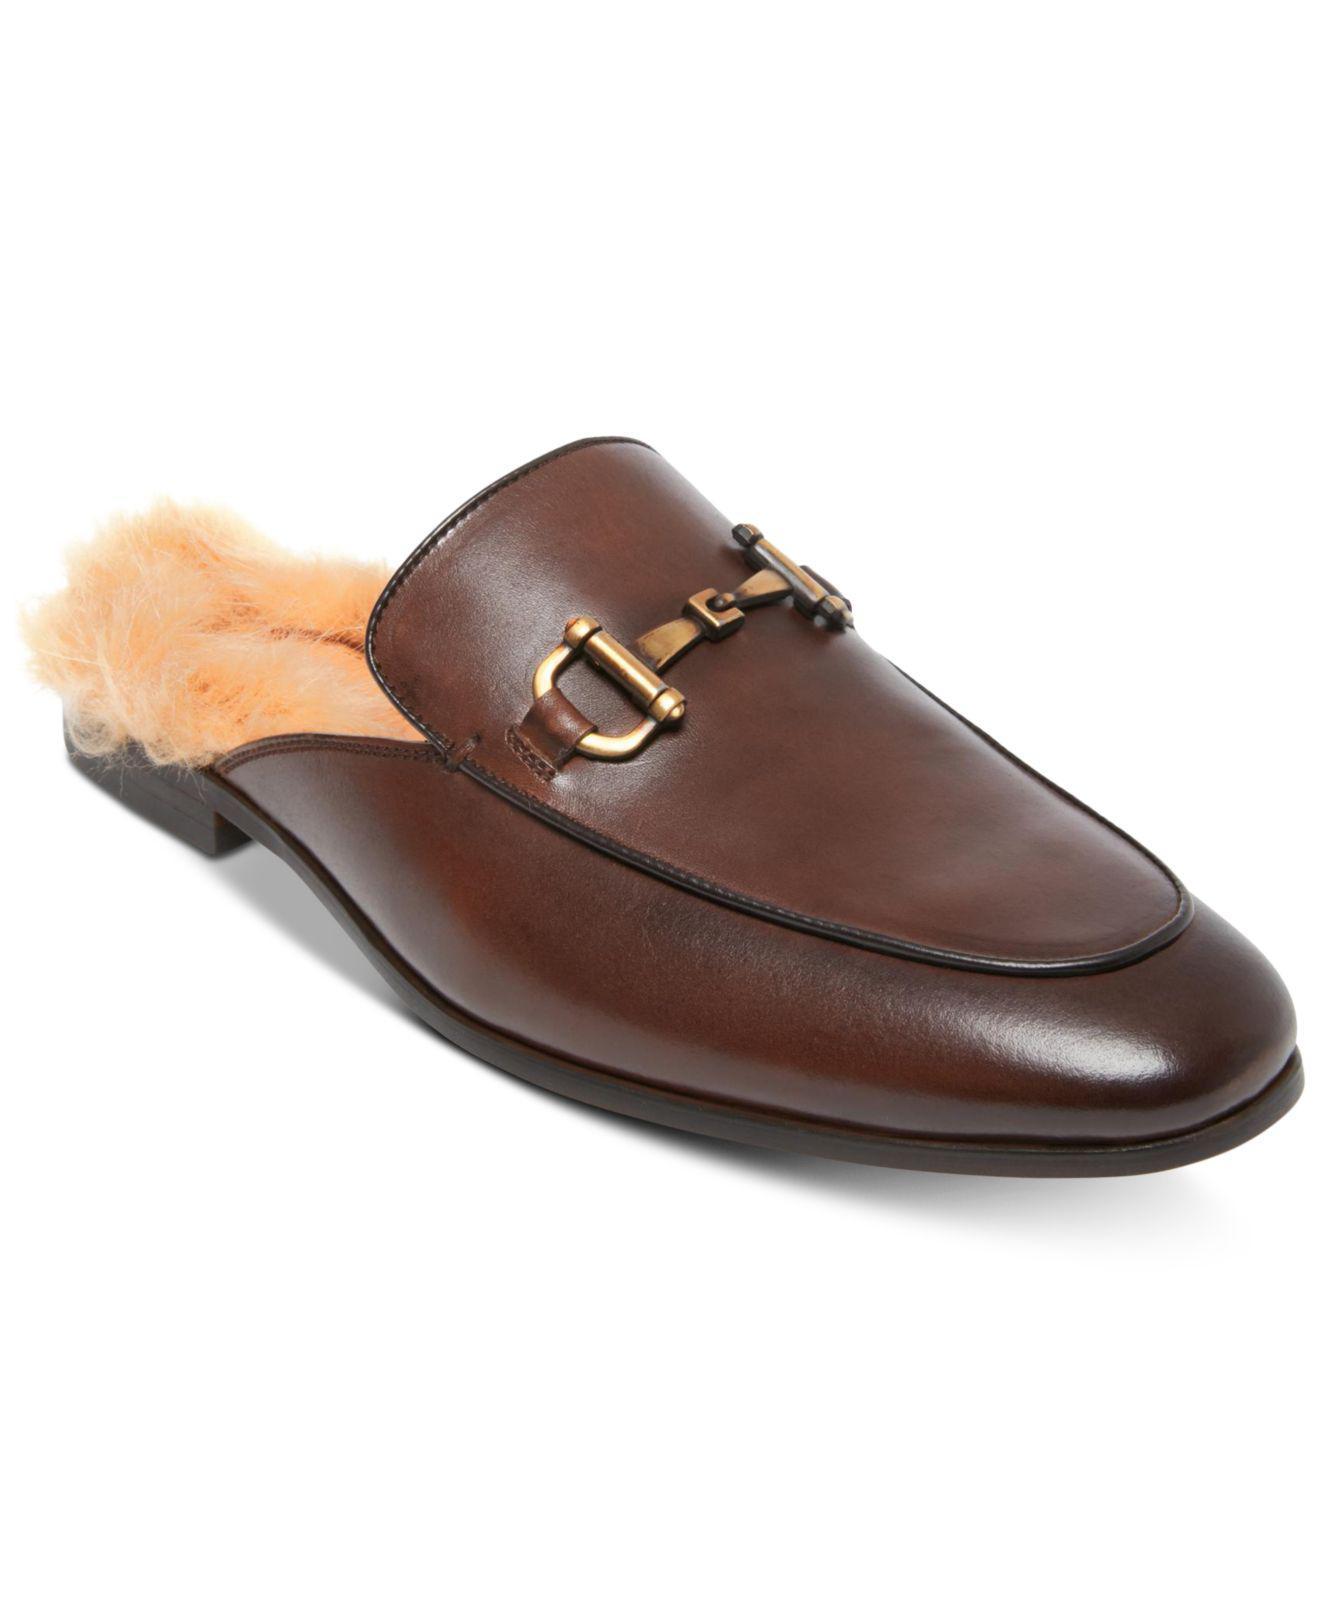 b4f96224d03 Lyst - Steve Madden Difranco Leather Bit Slip-ons in Brown for Men